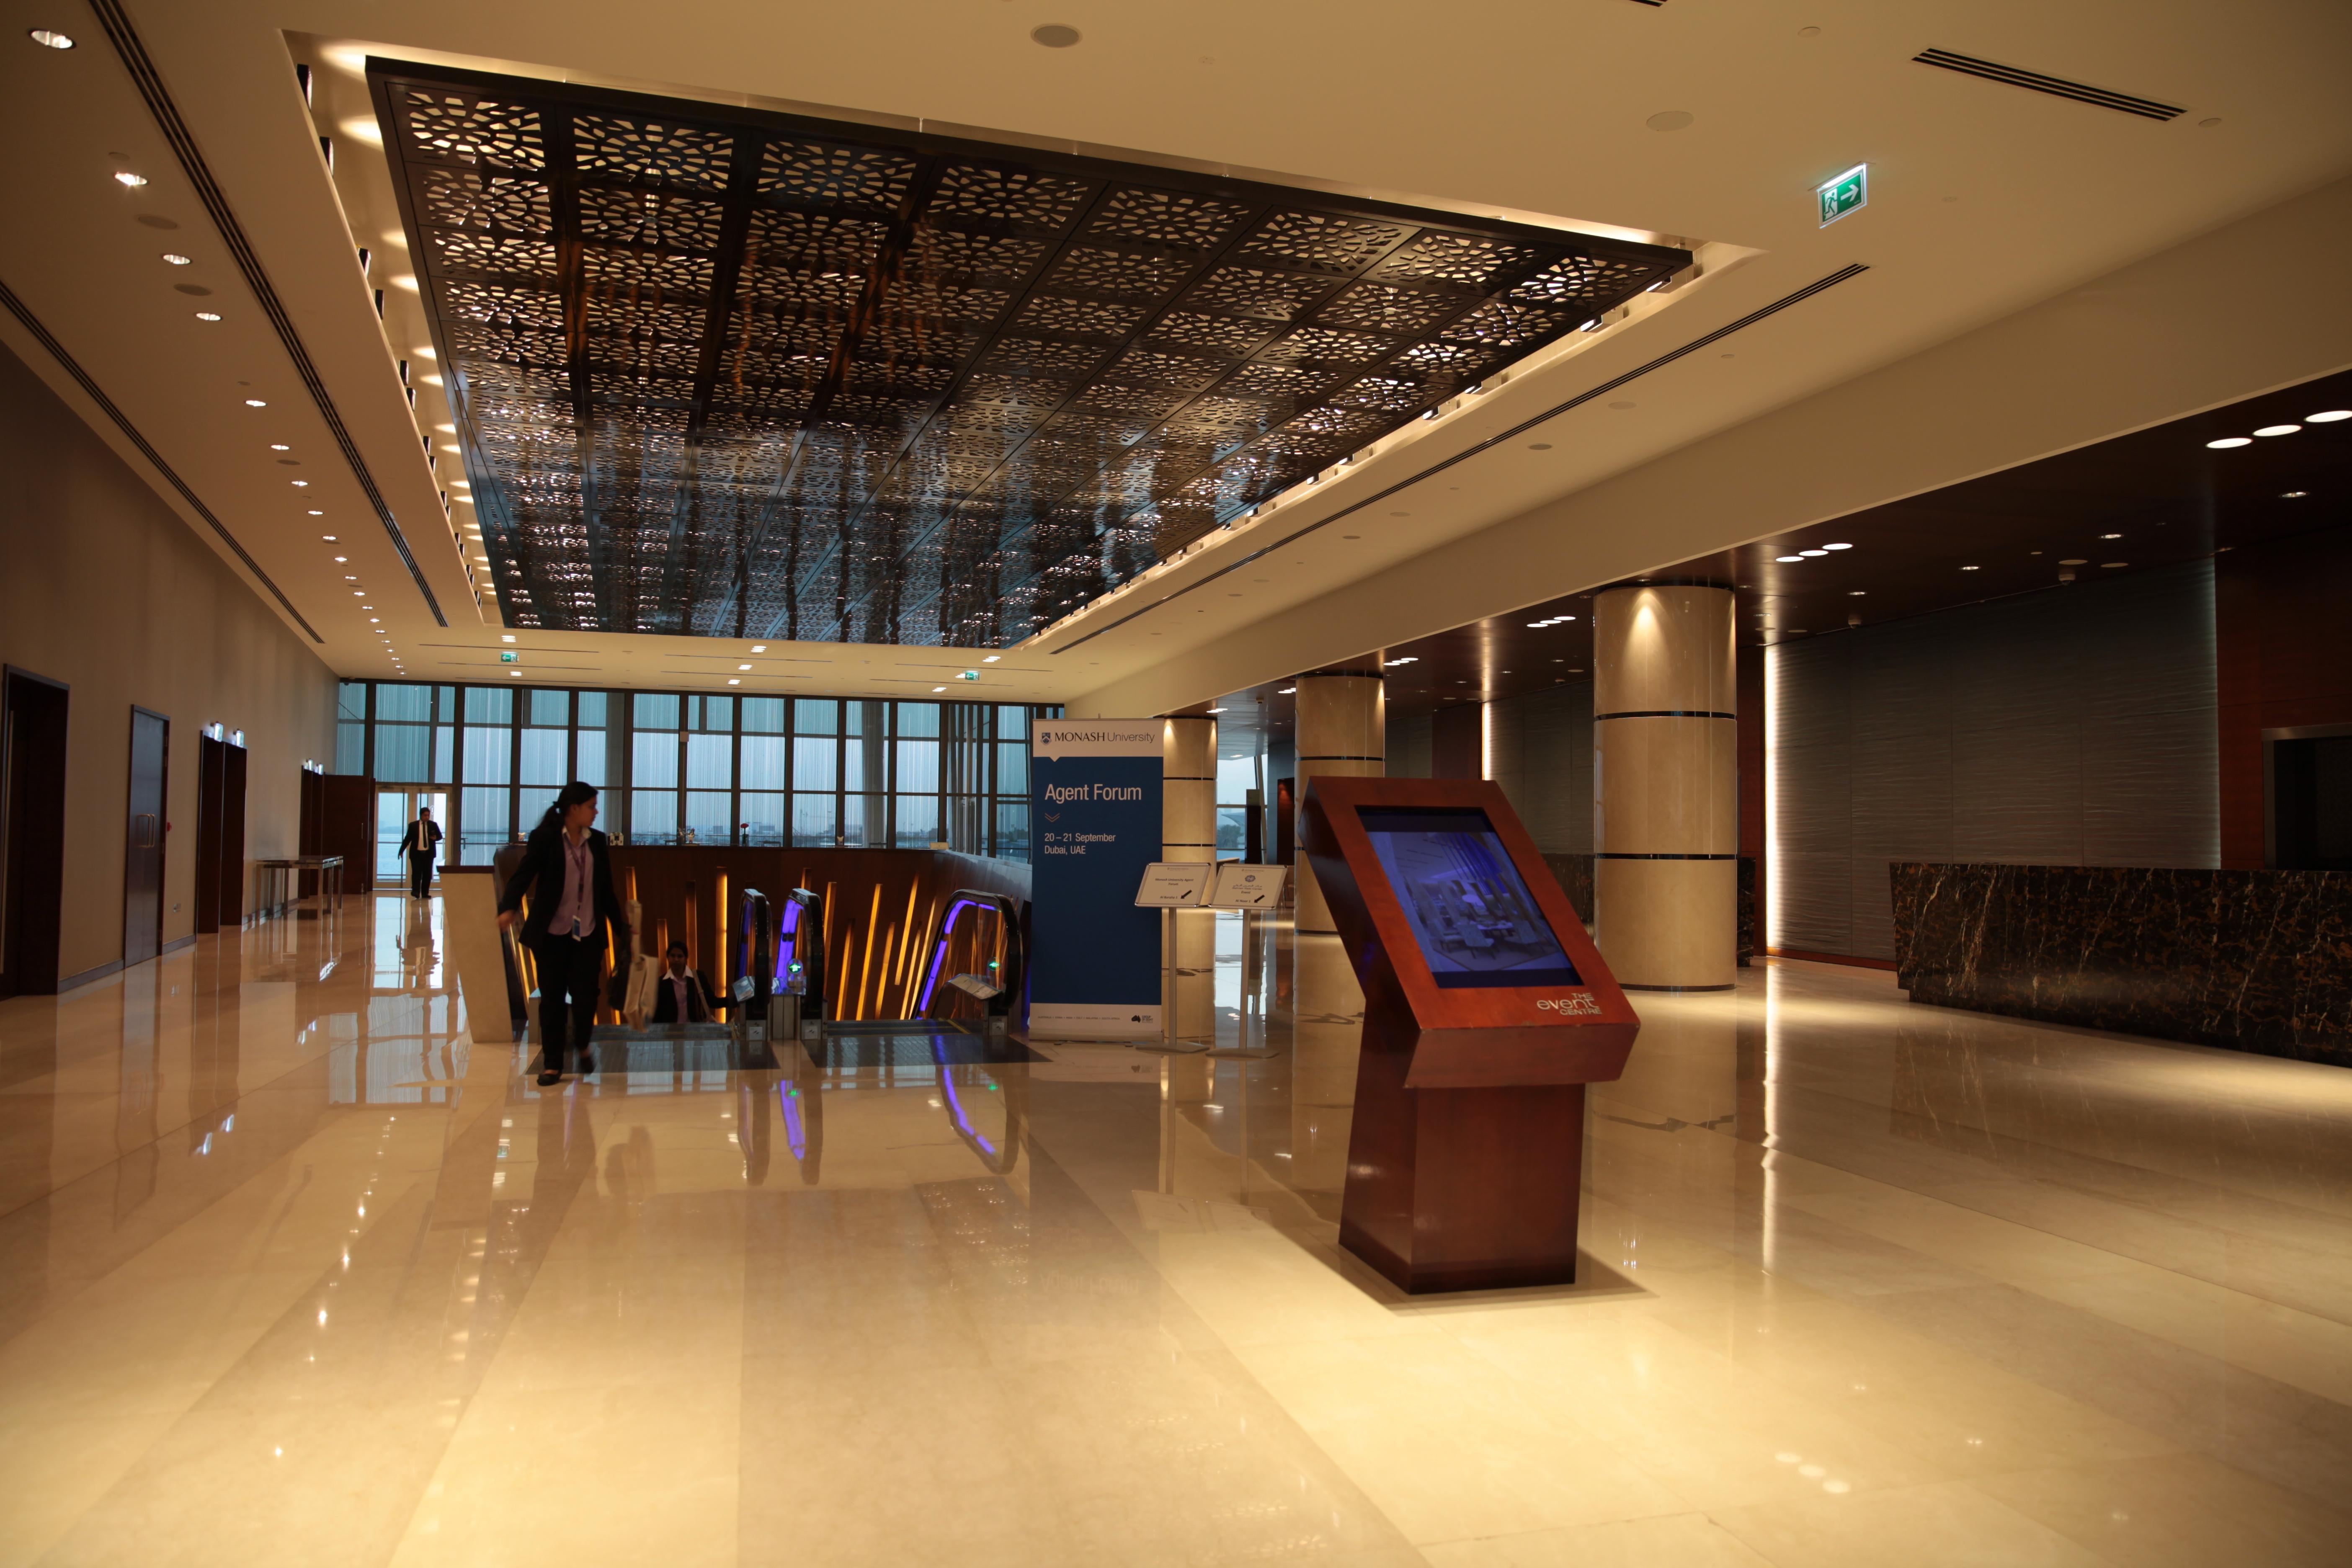 Intercontinental Hotel Lobby Sign